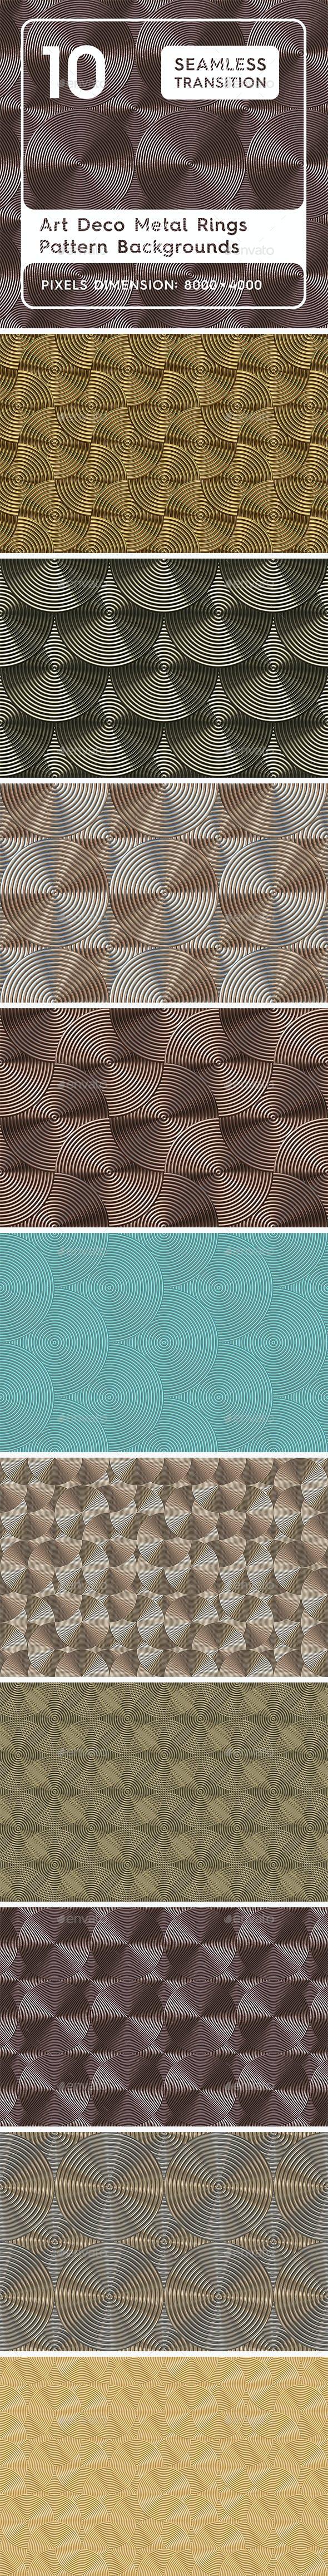 10 Art Deco Vintage Rings Pattern Backgrounds - 3DOcean Item for Sale